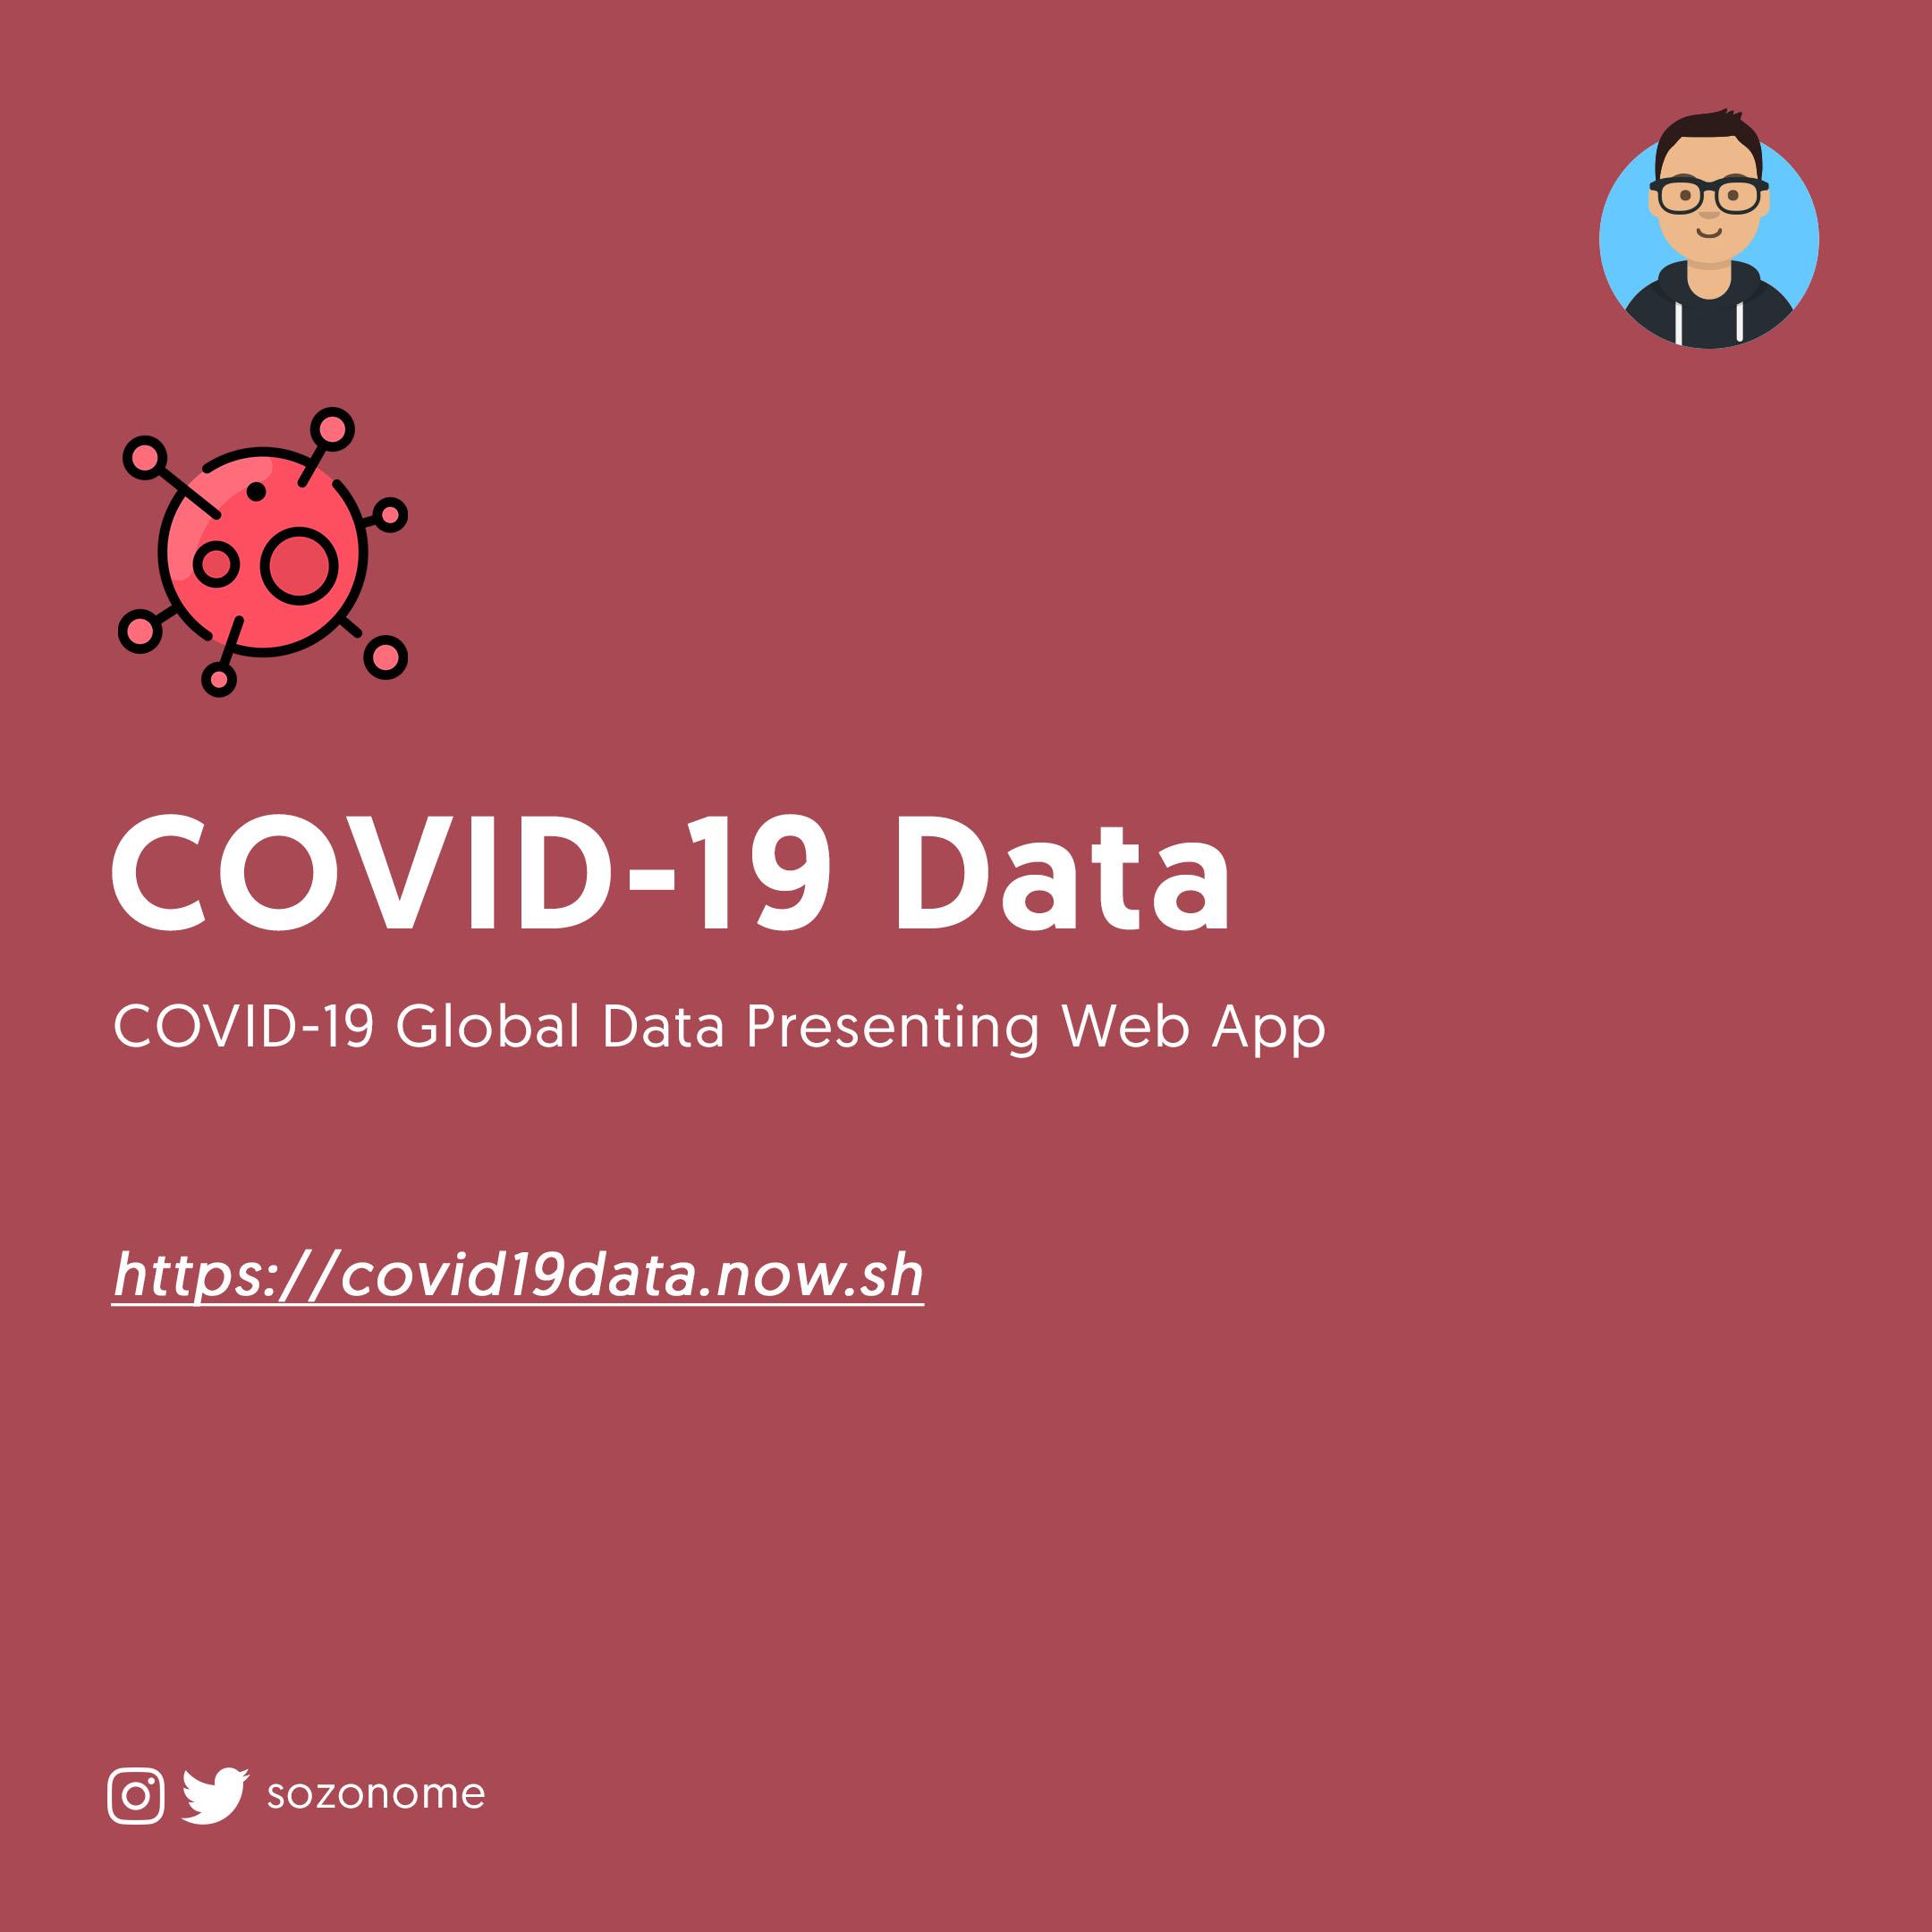 COVID-19 Data App (1)